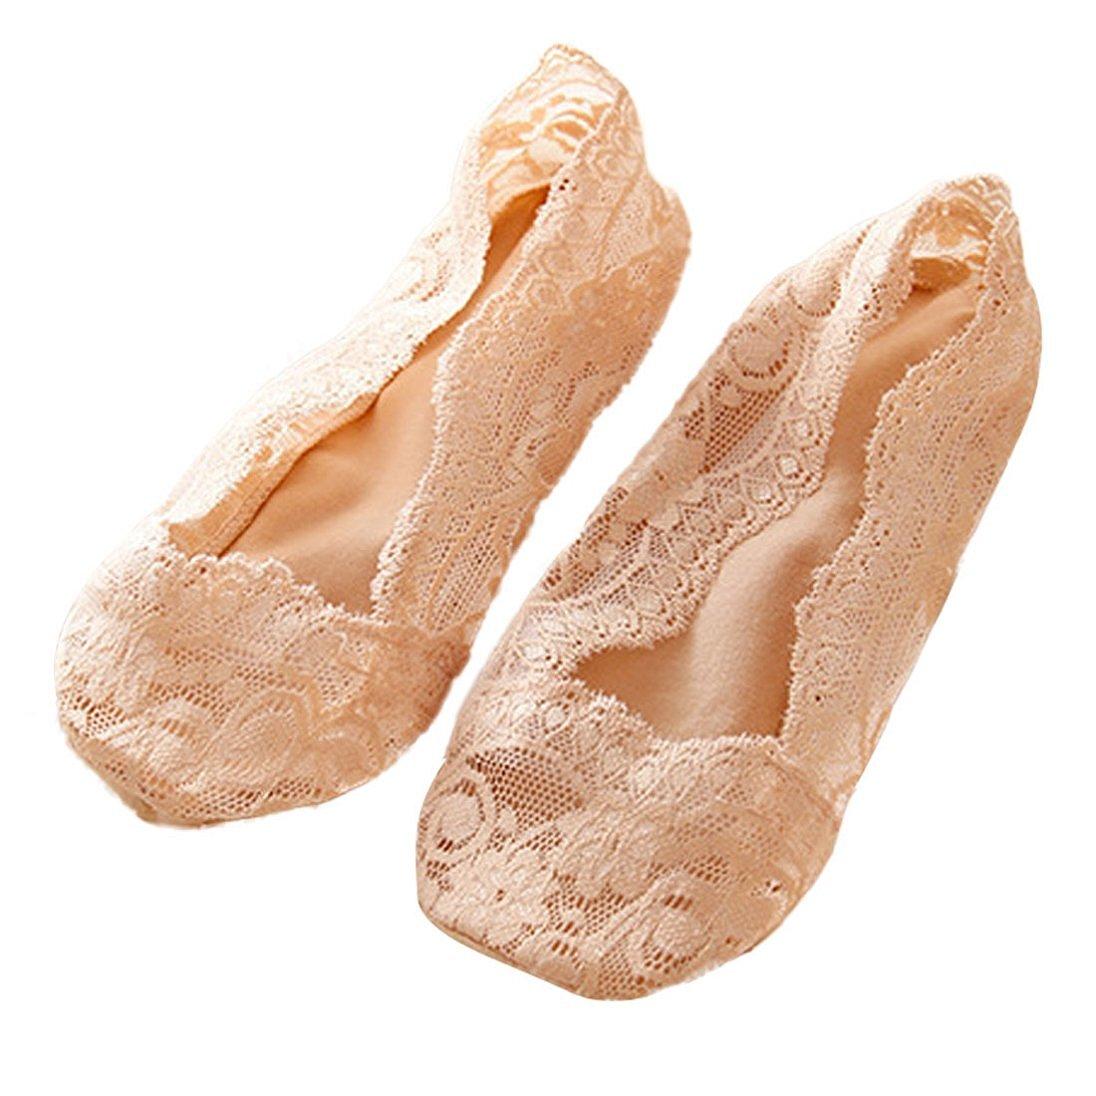 No Show Socks, AutumnFall(TM) 1 Pair Fashion Ladies Women Lace Antislip Socks, Ankle Socks, No Show Socks, Lace Link